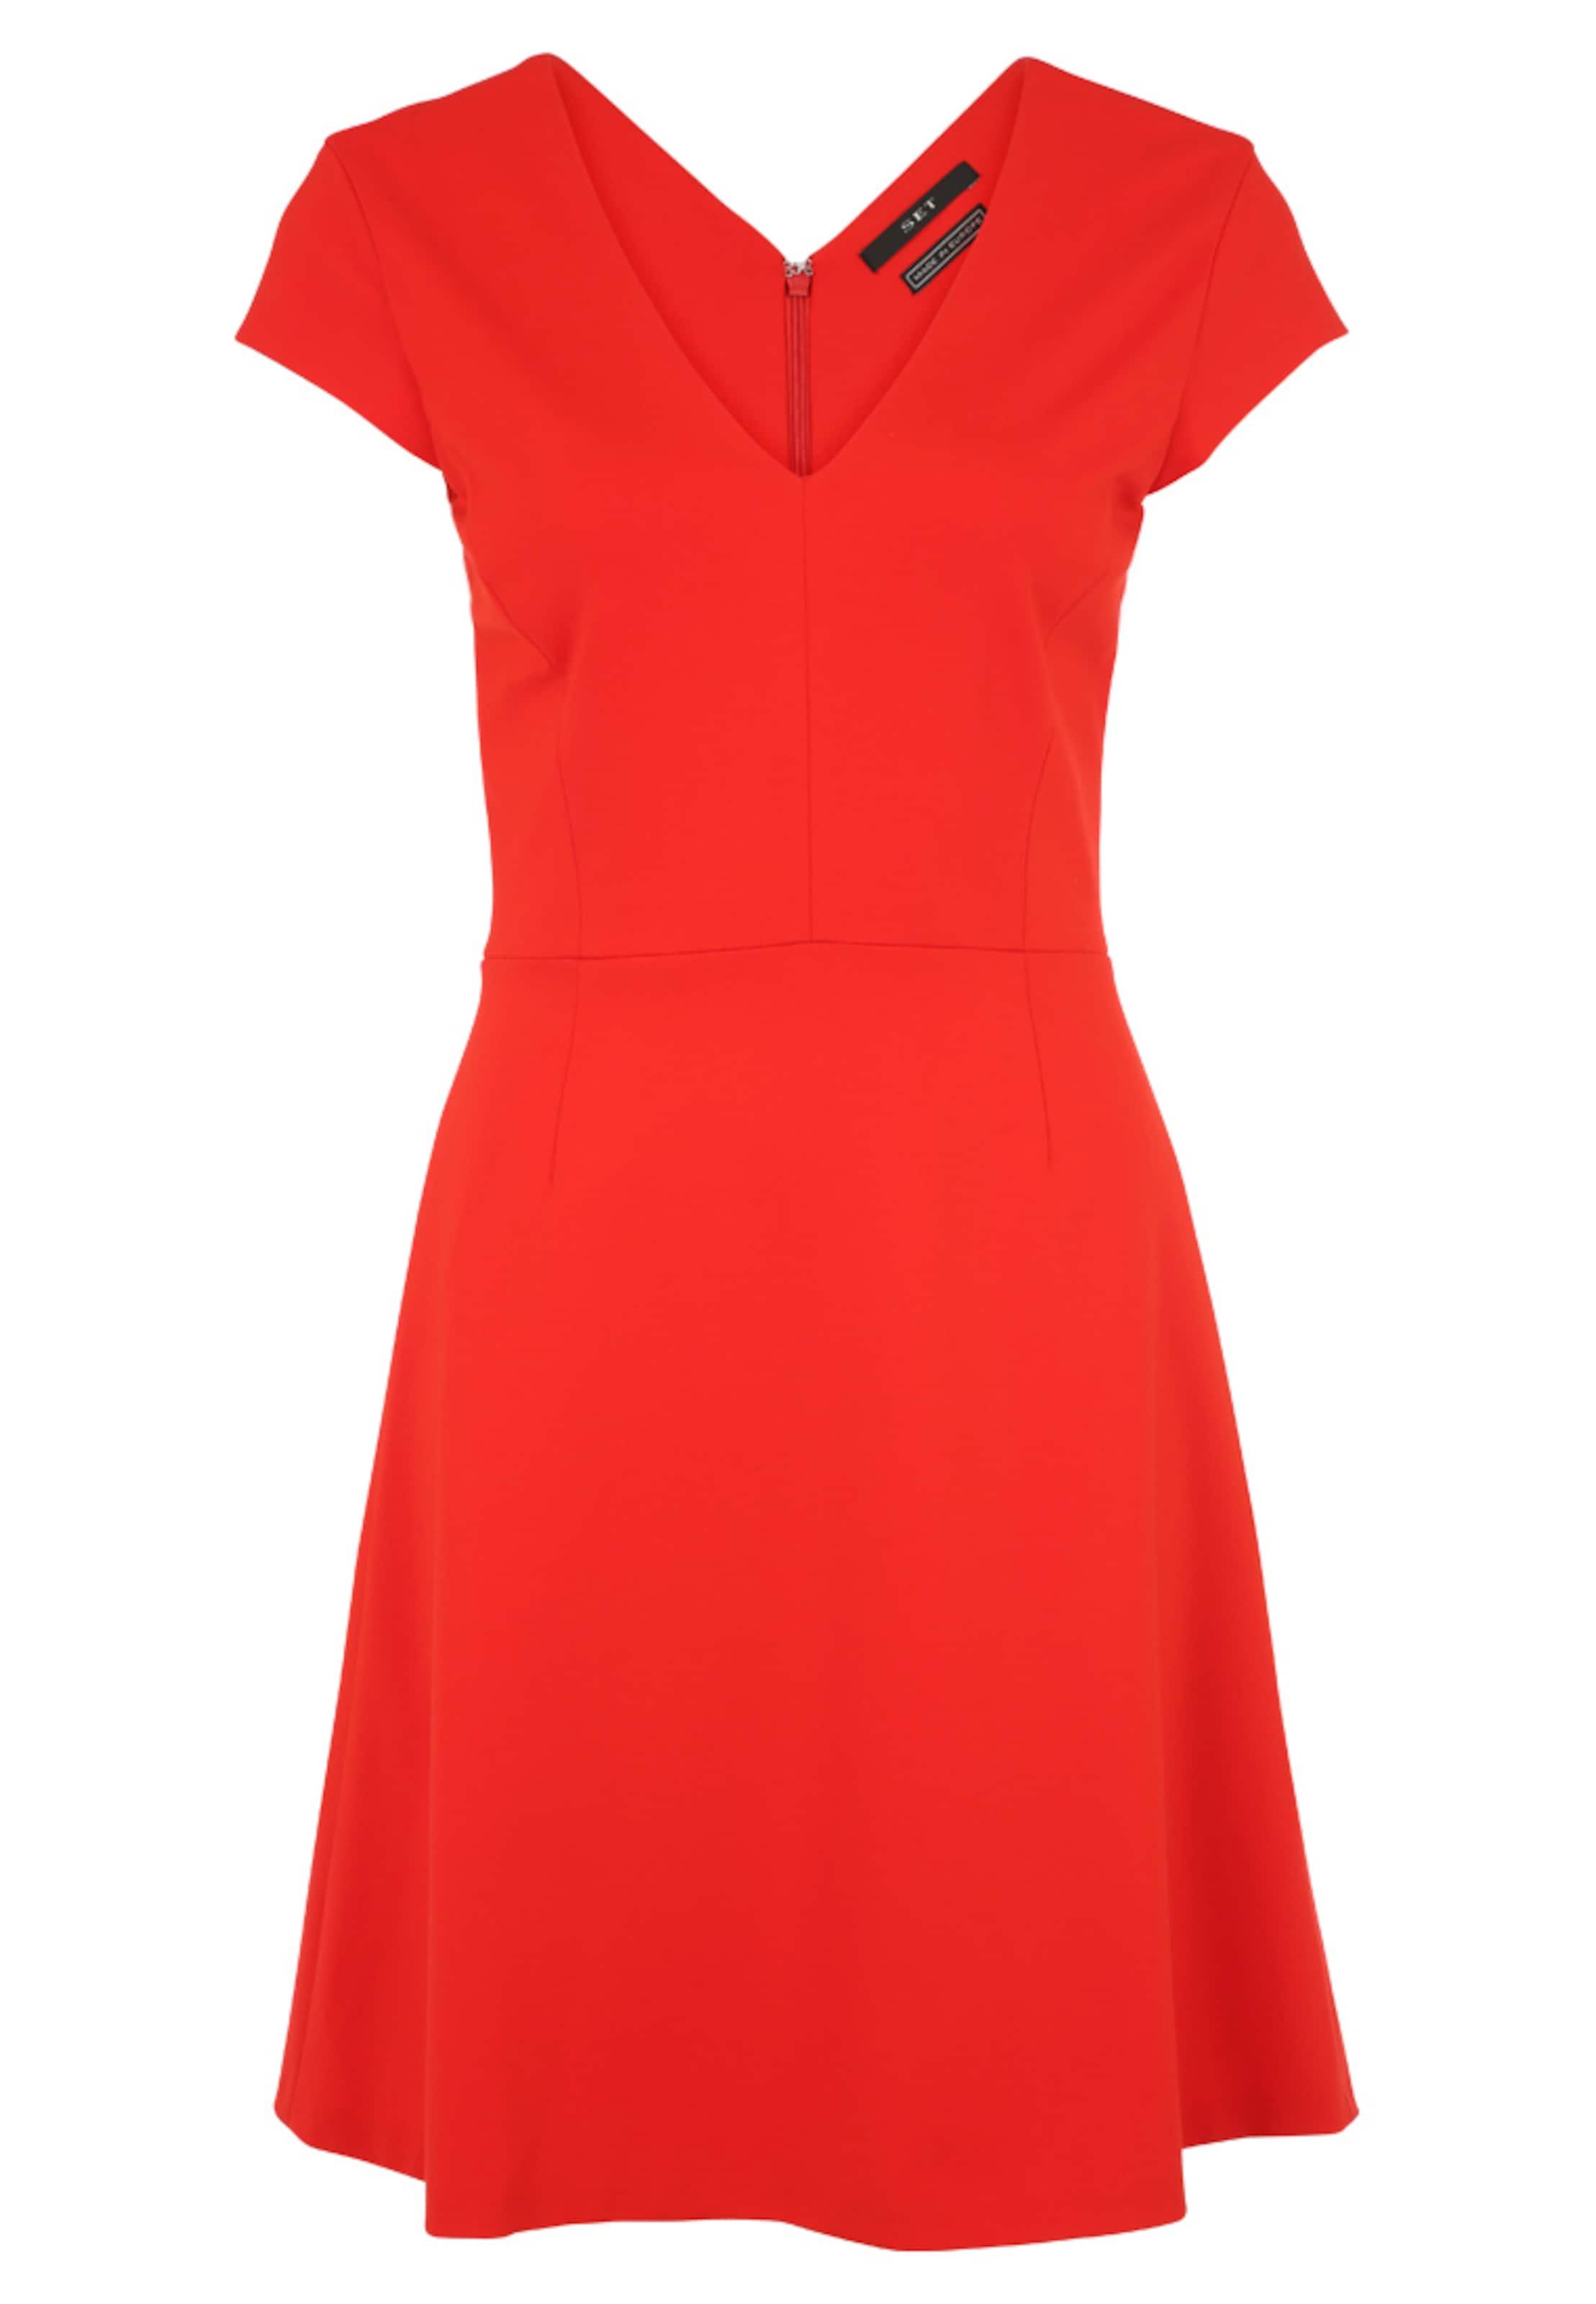 Rot Kleid Rot Set Kleid Set Kleid Set In In cTKlJ3F1